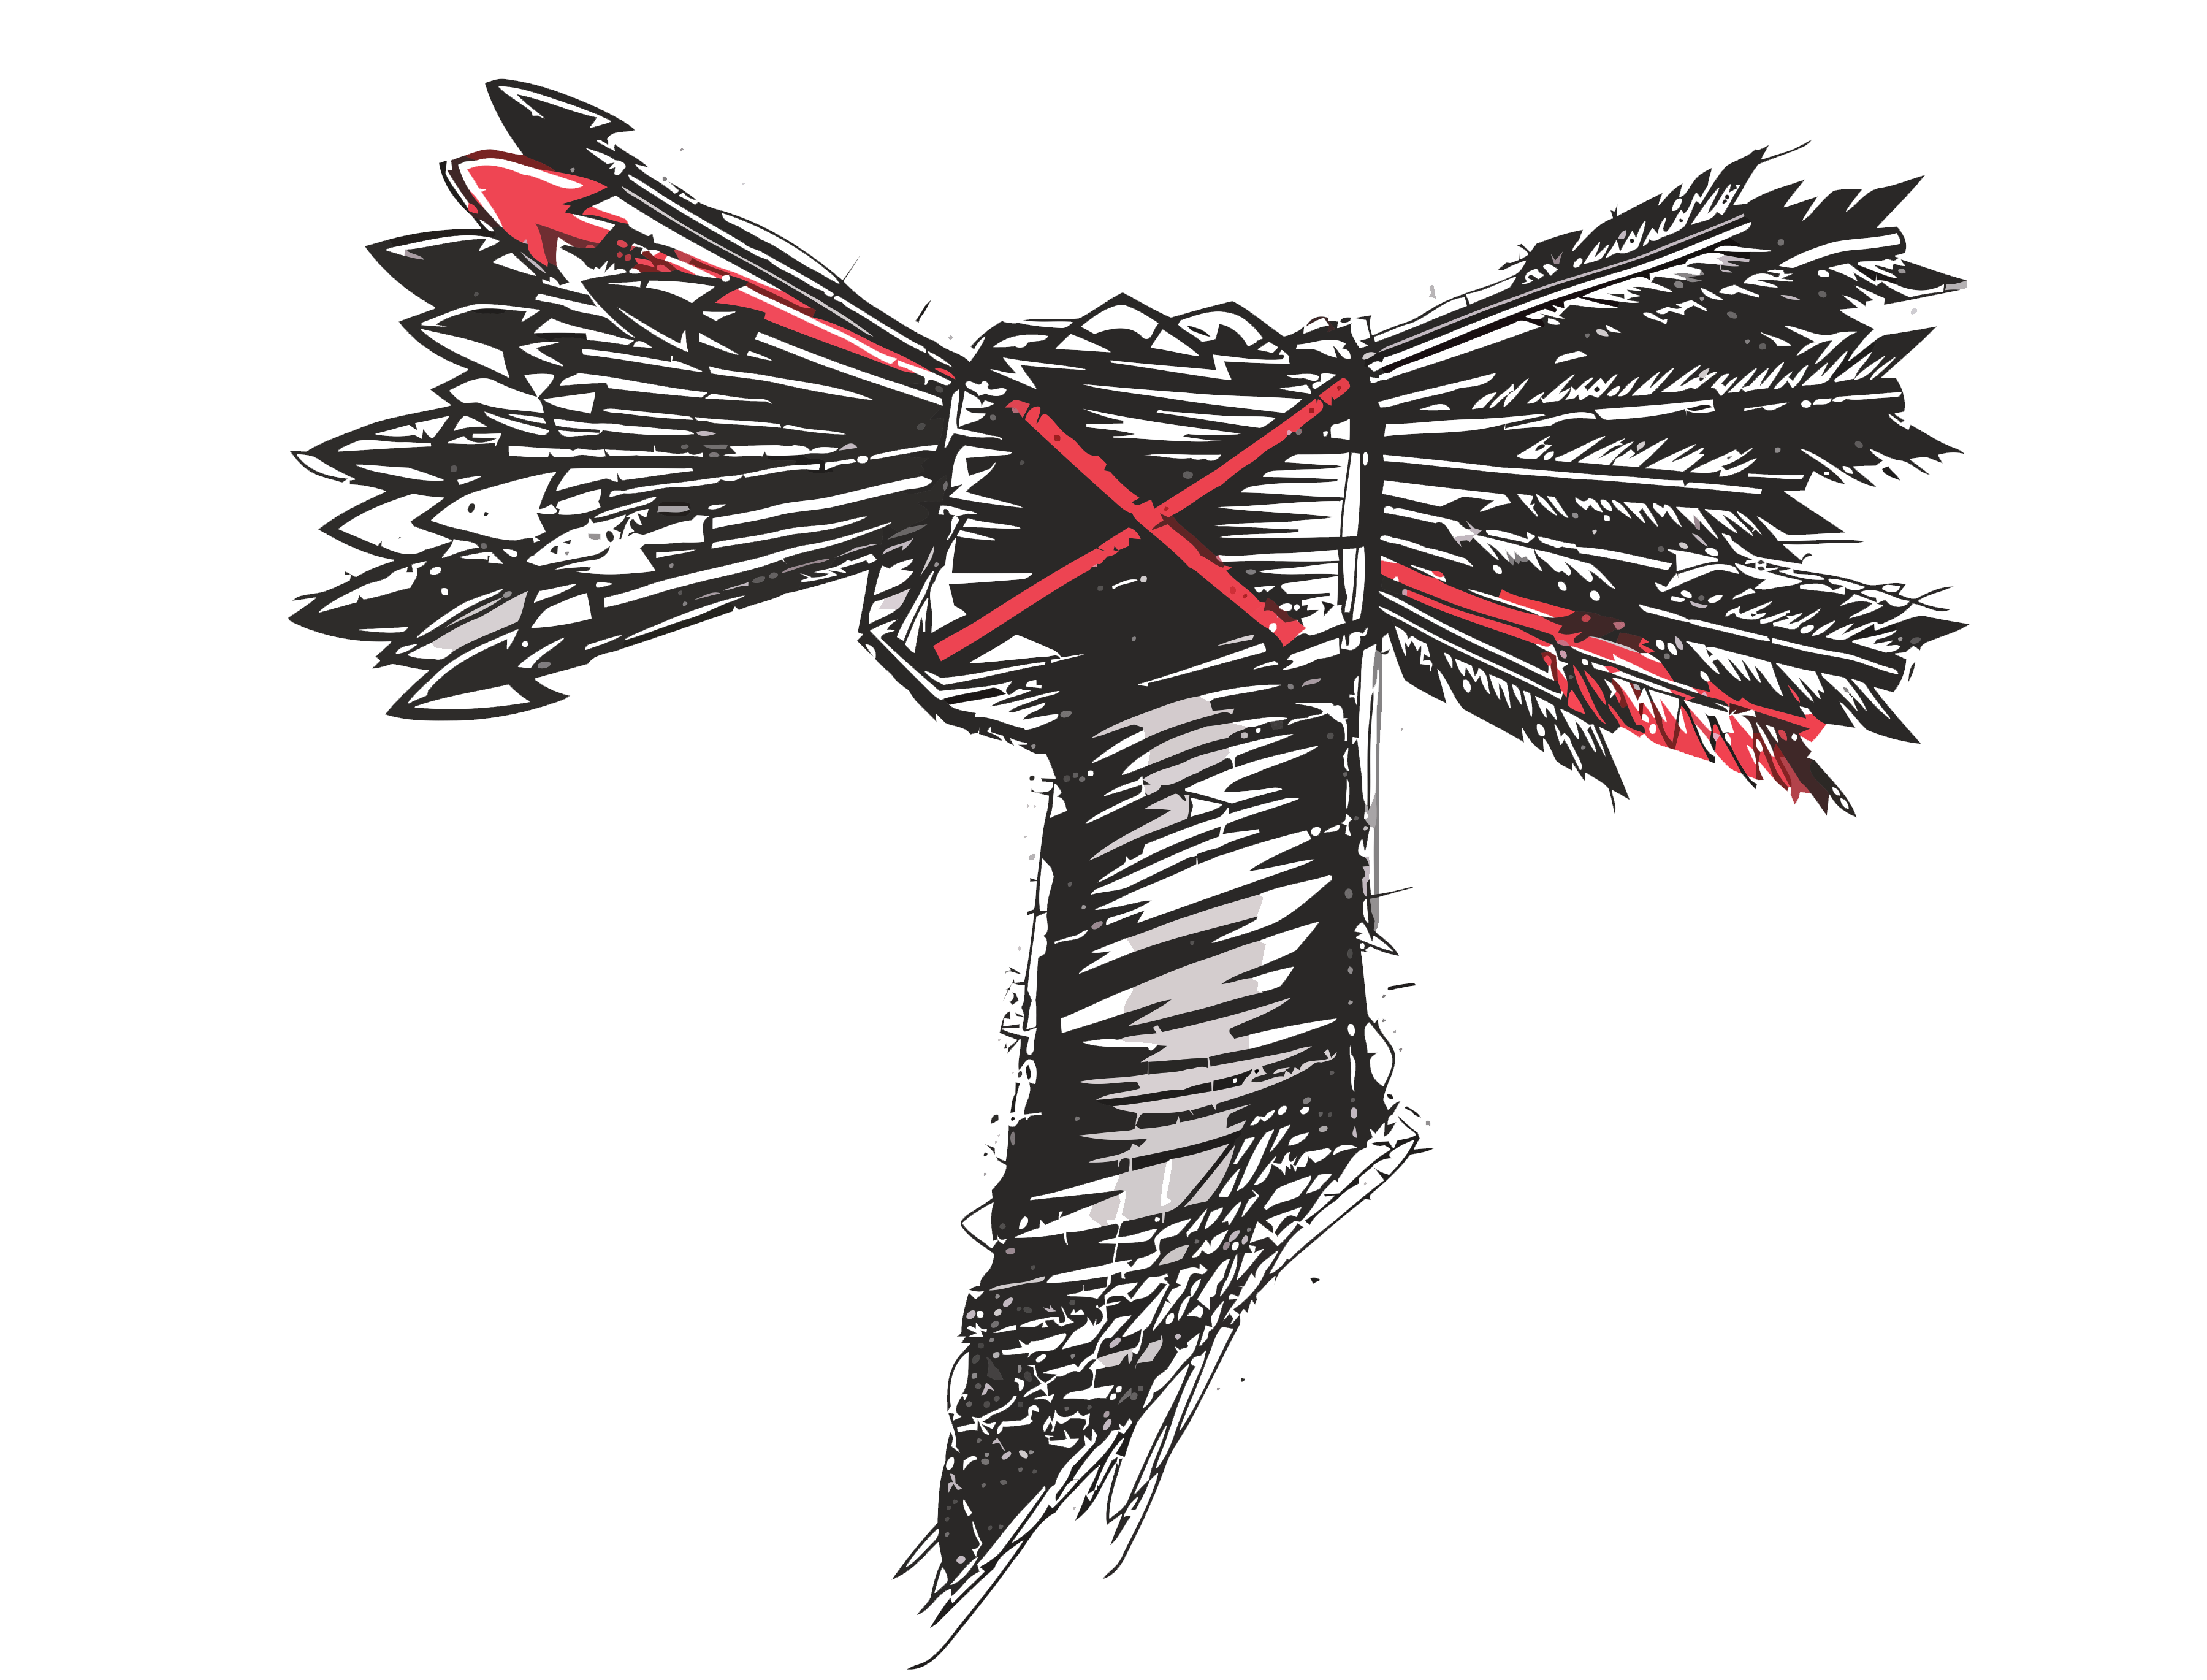 Cm Punk Logo Wallpapers 2016 3600x2740